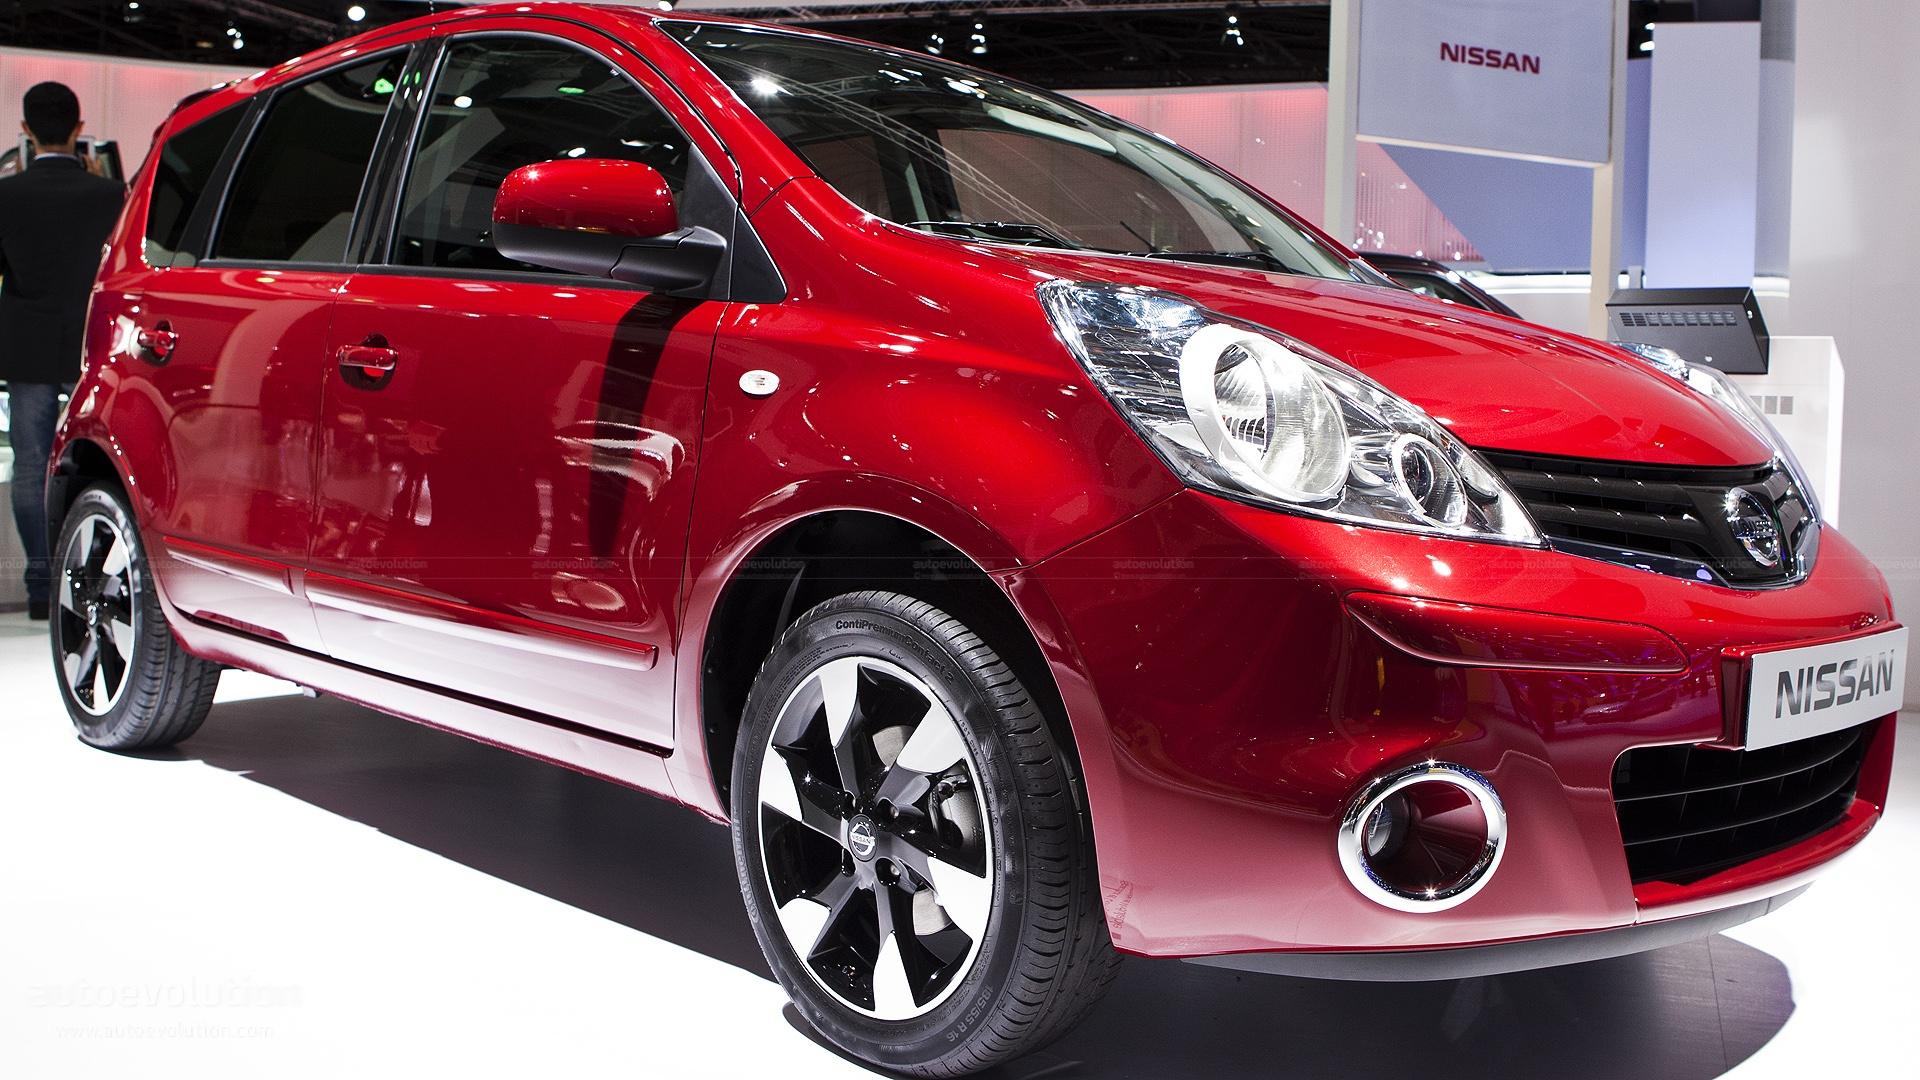 Custom Nissan Maxima >> Paris 2012: Nissan Note Facelift [Live Photos] - autoevolution